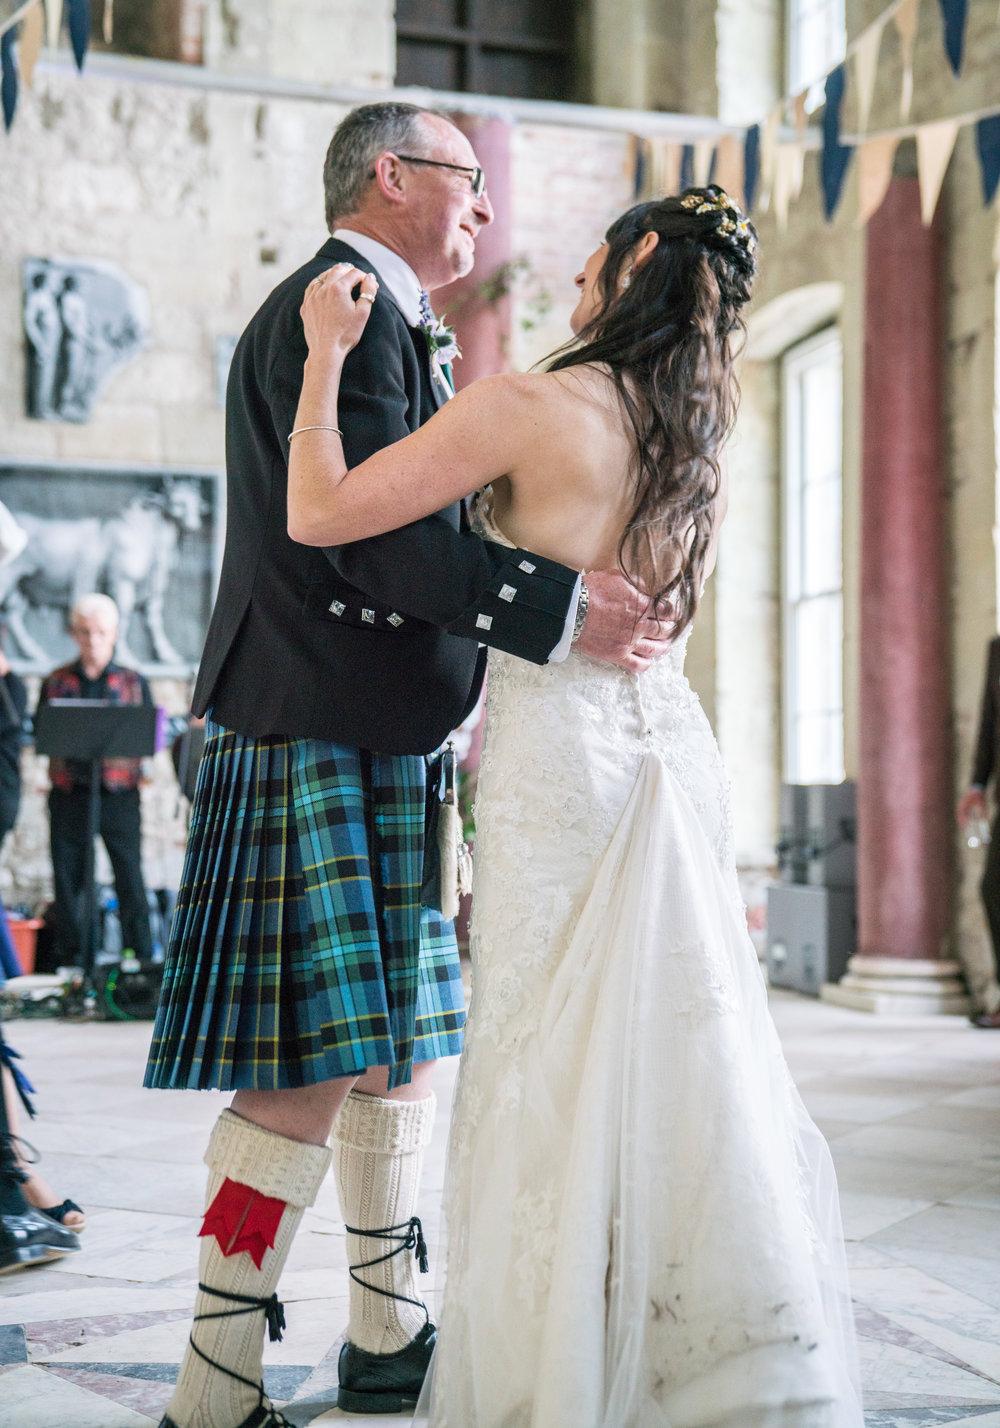 Nat & Pete-Wedding-Pre-Post-Ceremony (3 of 45).jpg